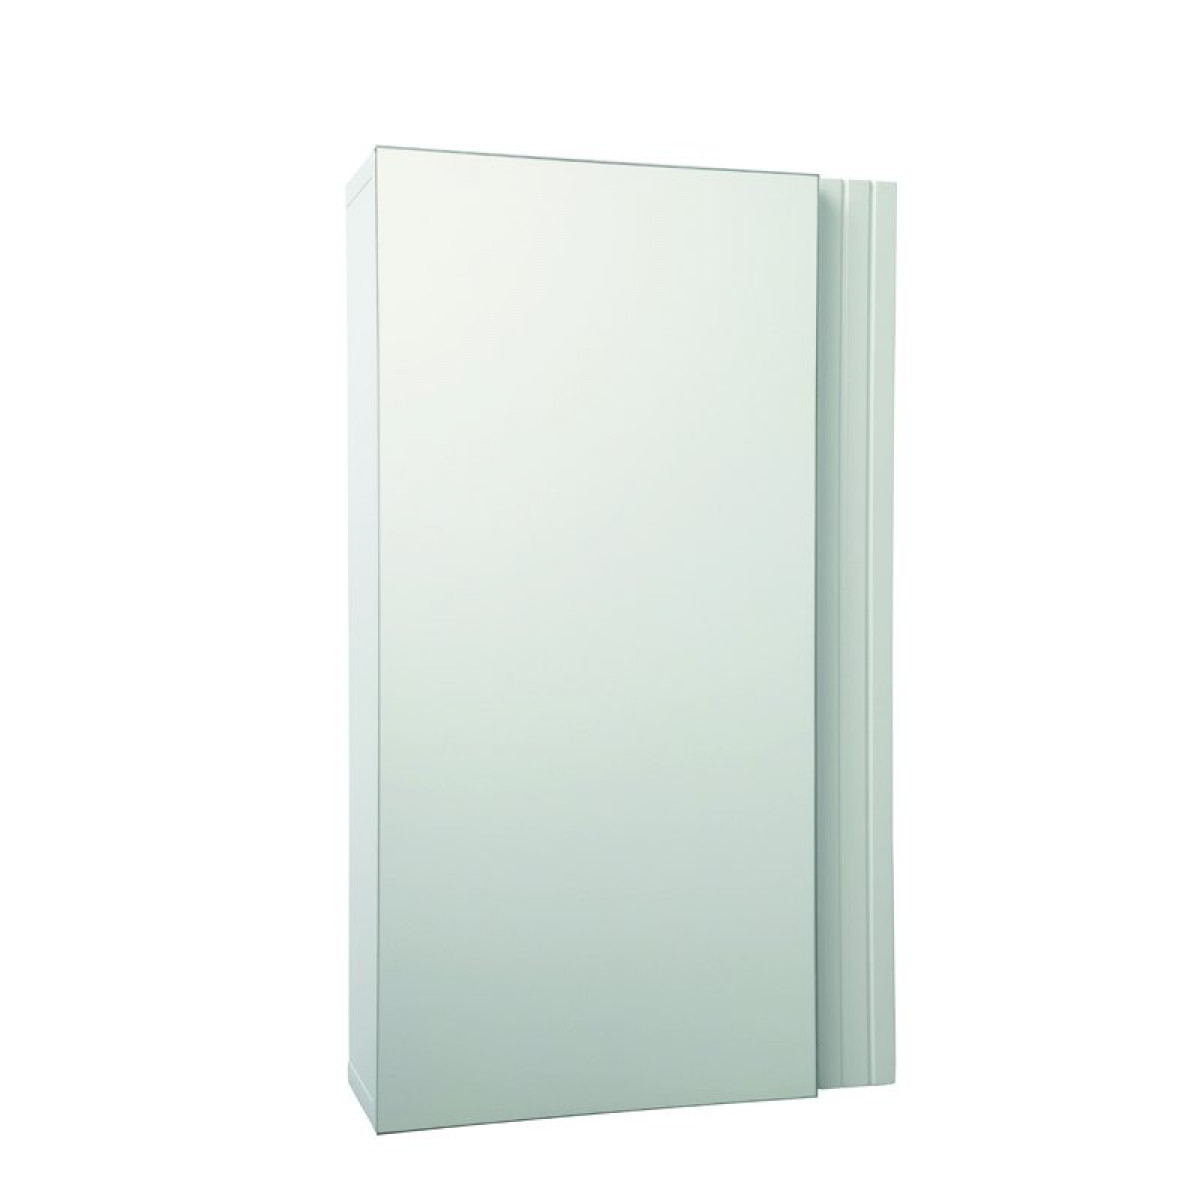 croydex white single door cabinet wc410122